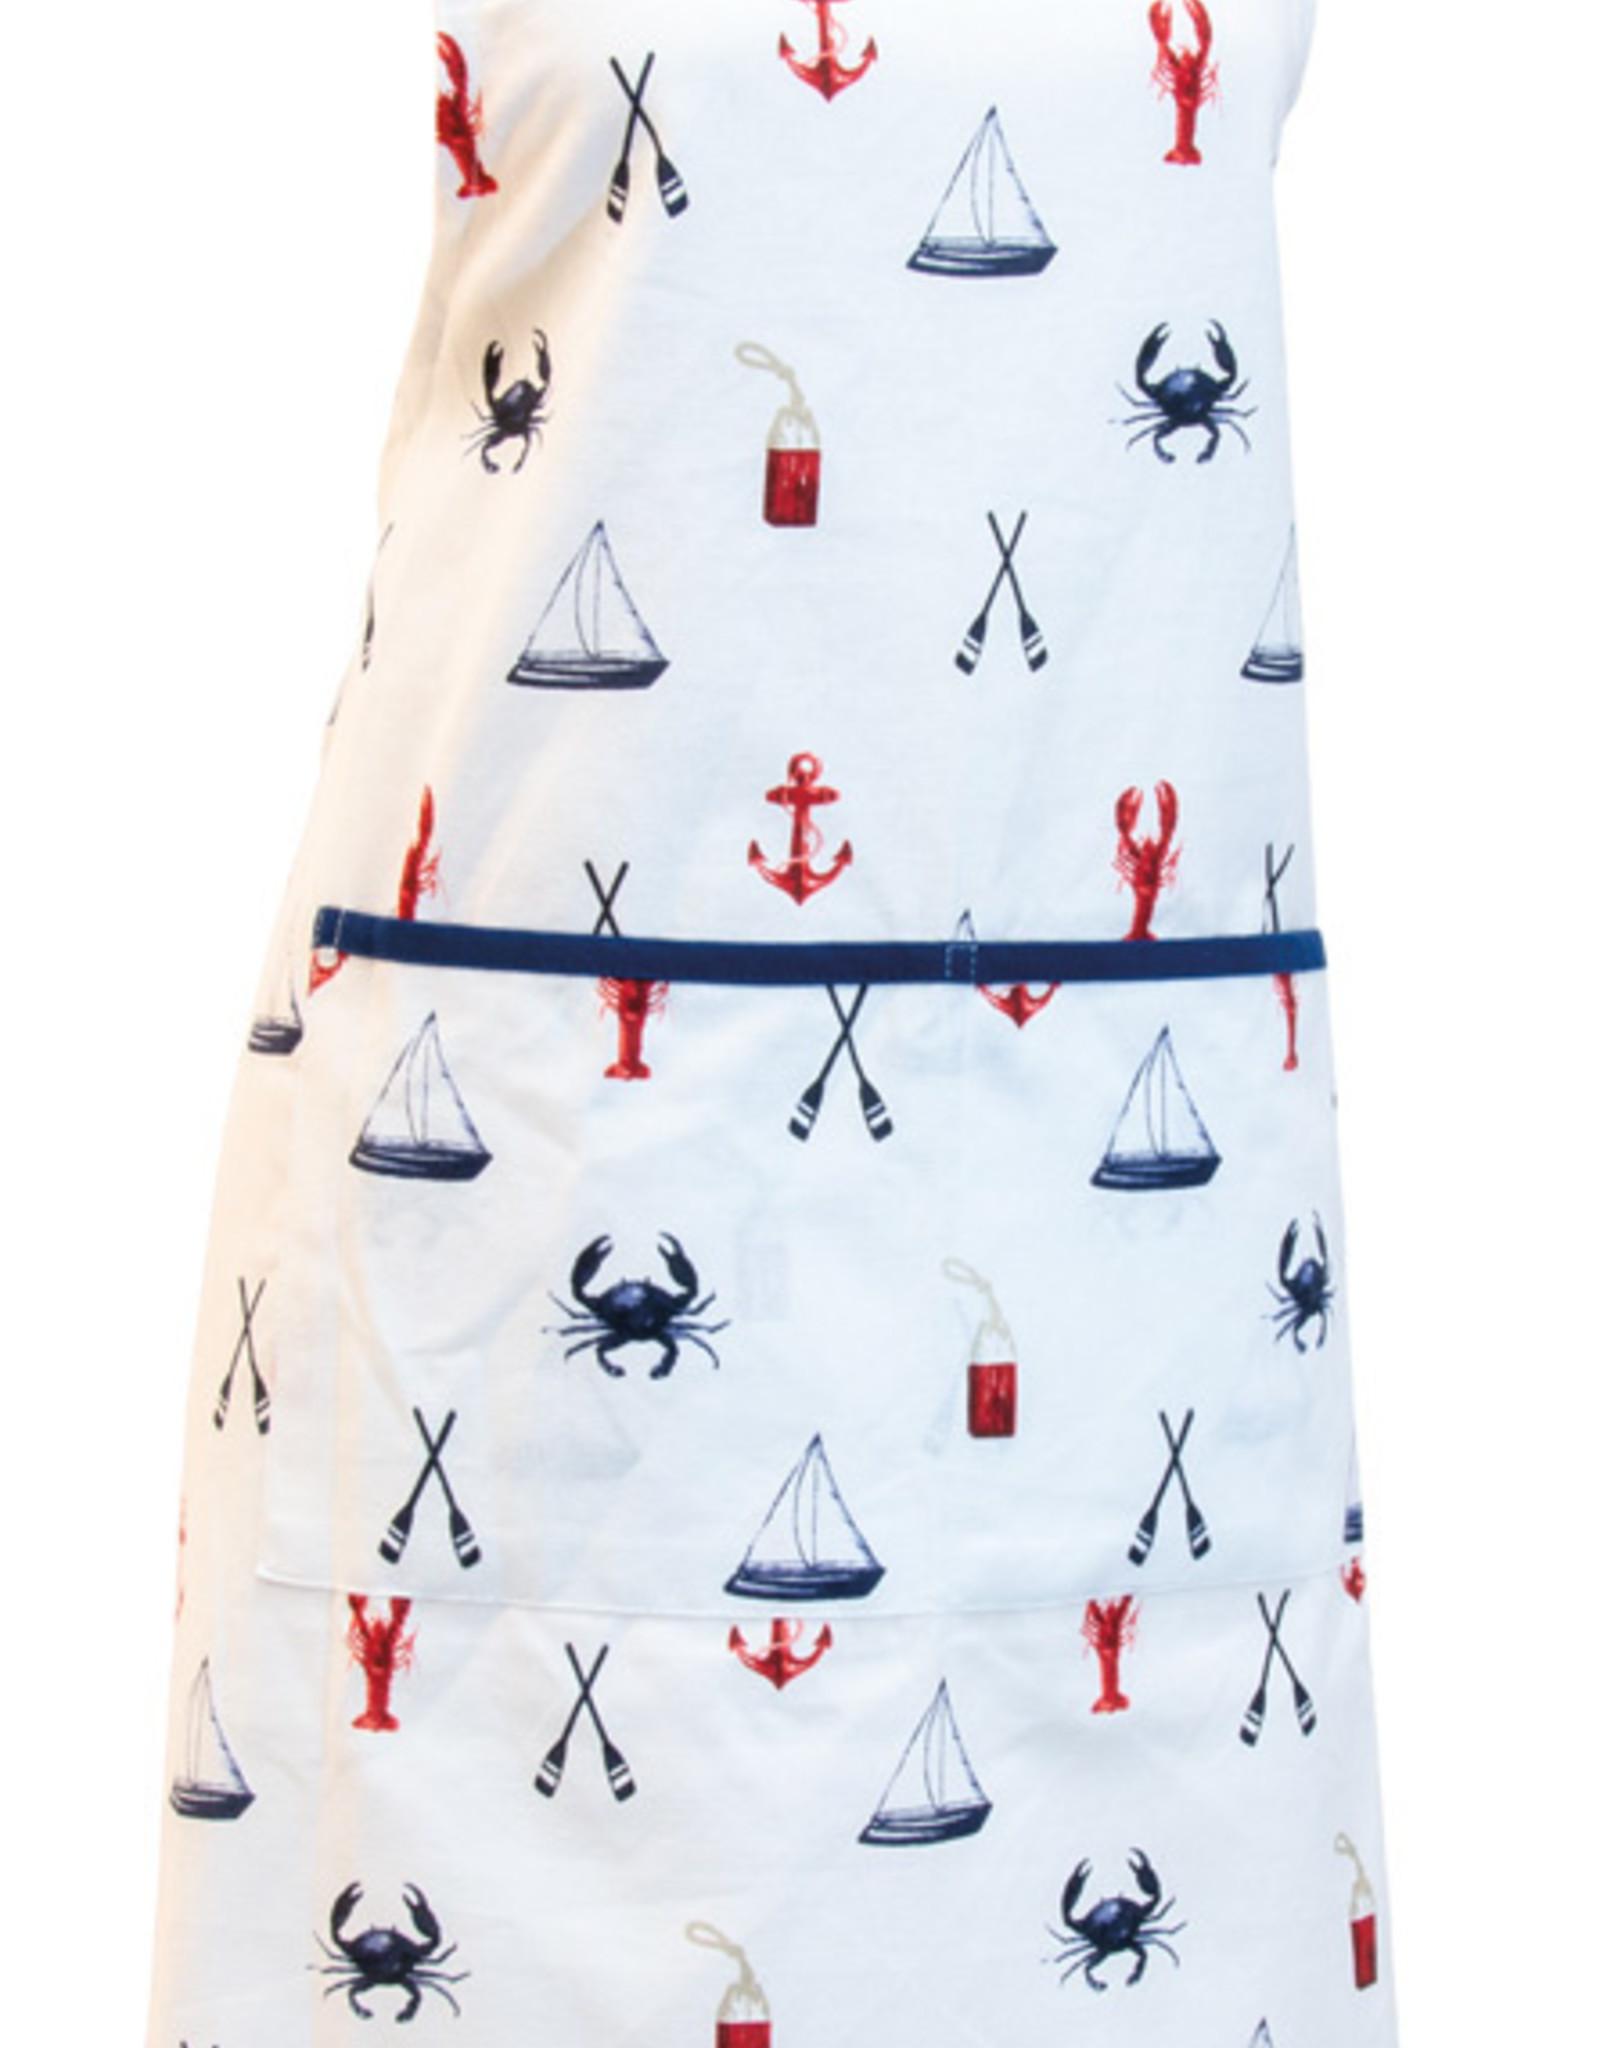 Boston International Apron, Nautical Icons